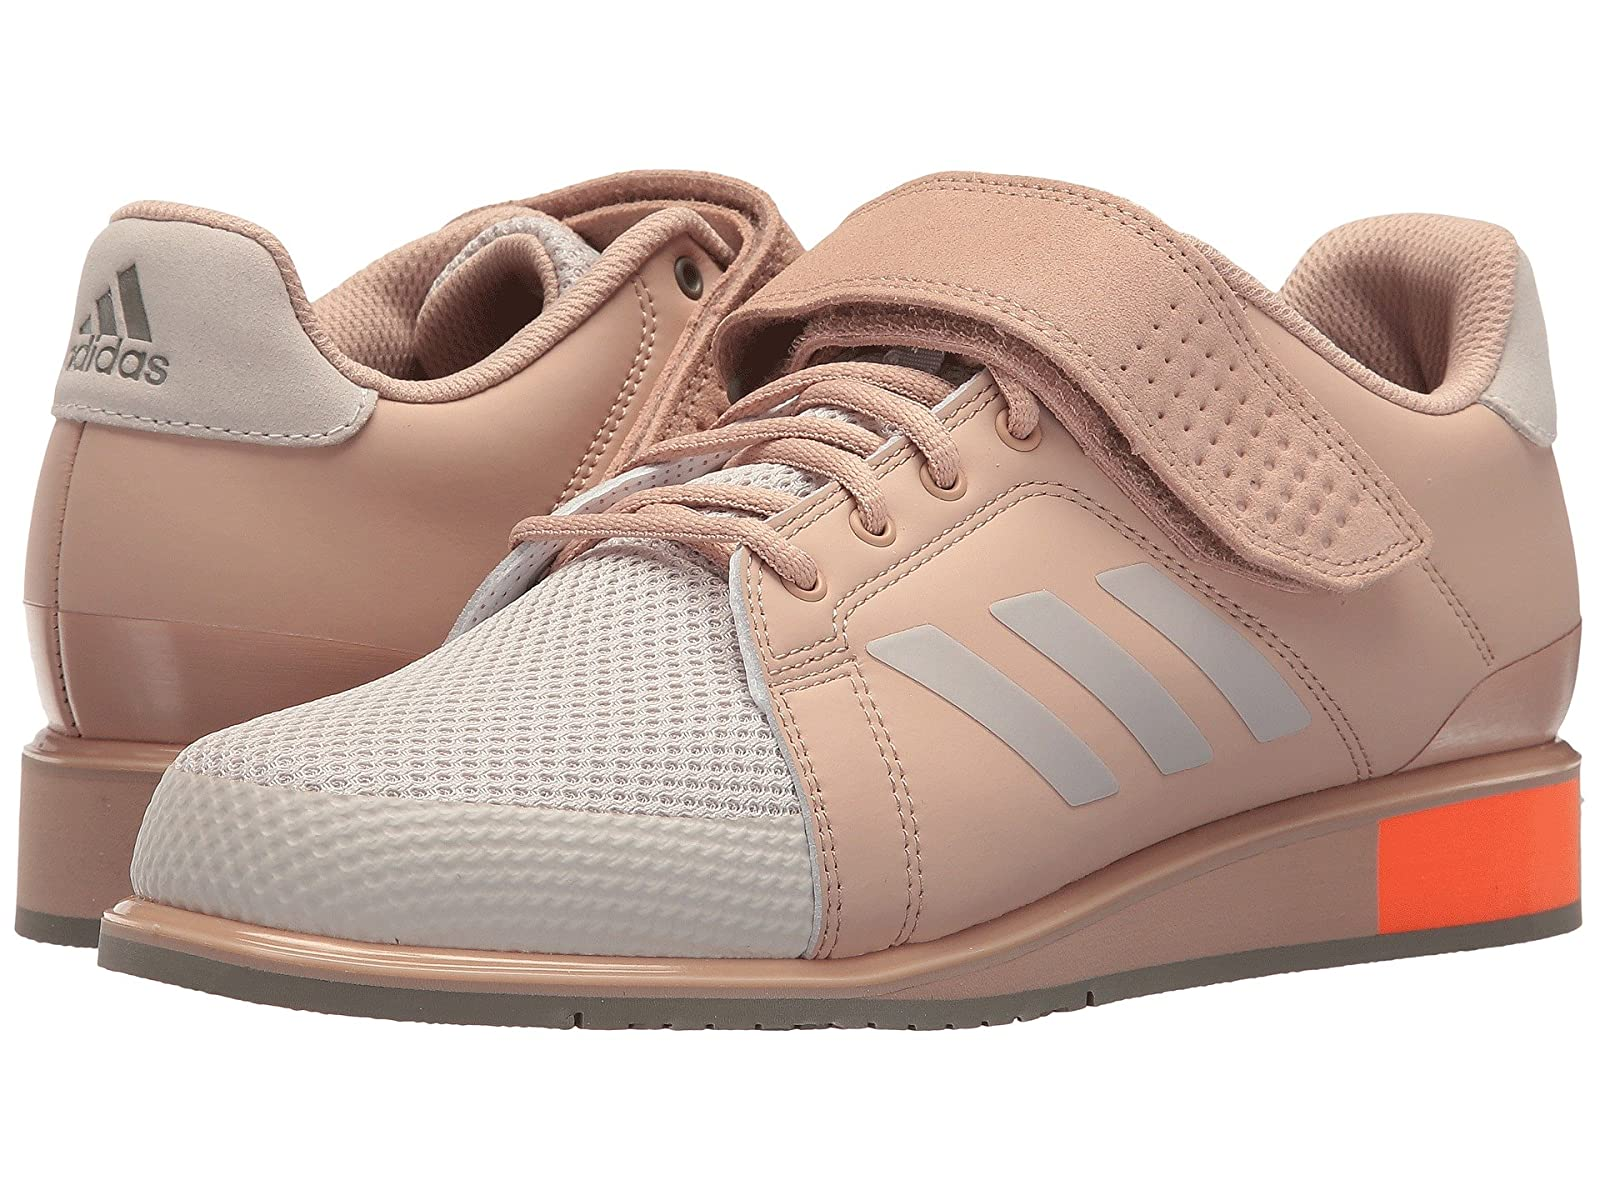 adidas Power Perfect IIIStylish and characteristic shoes